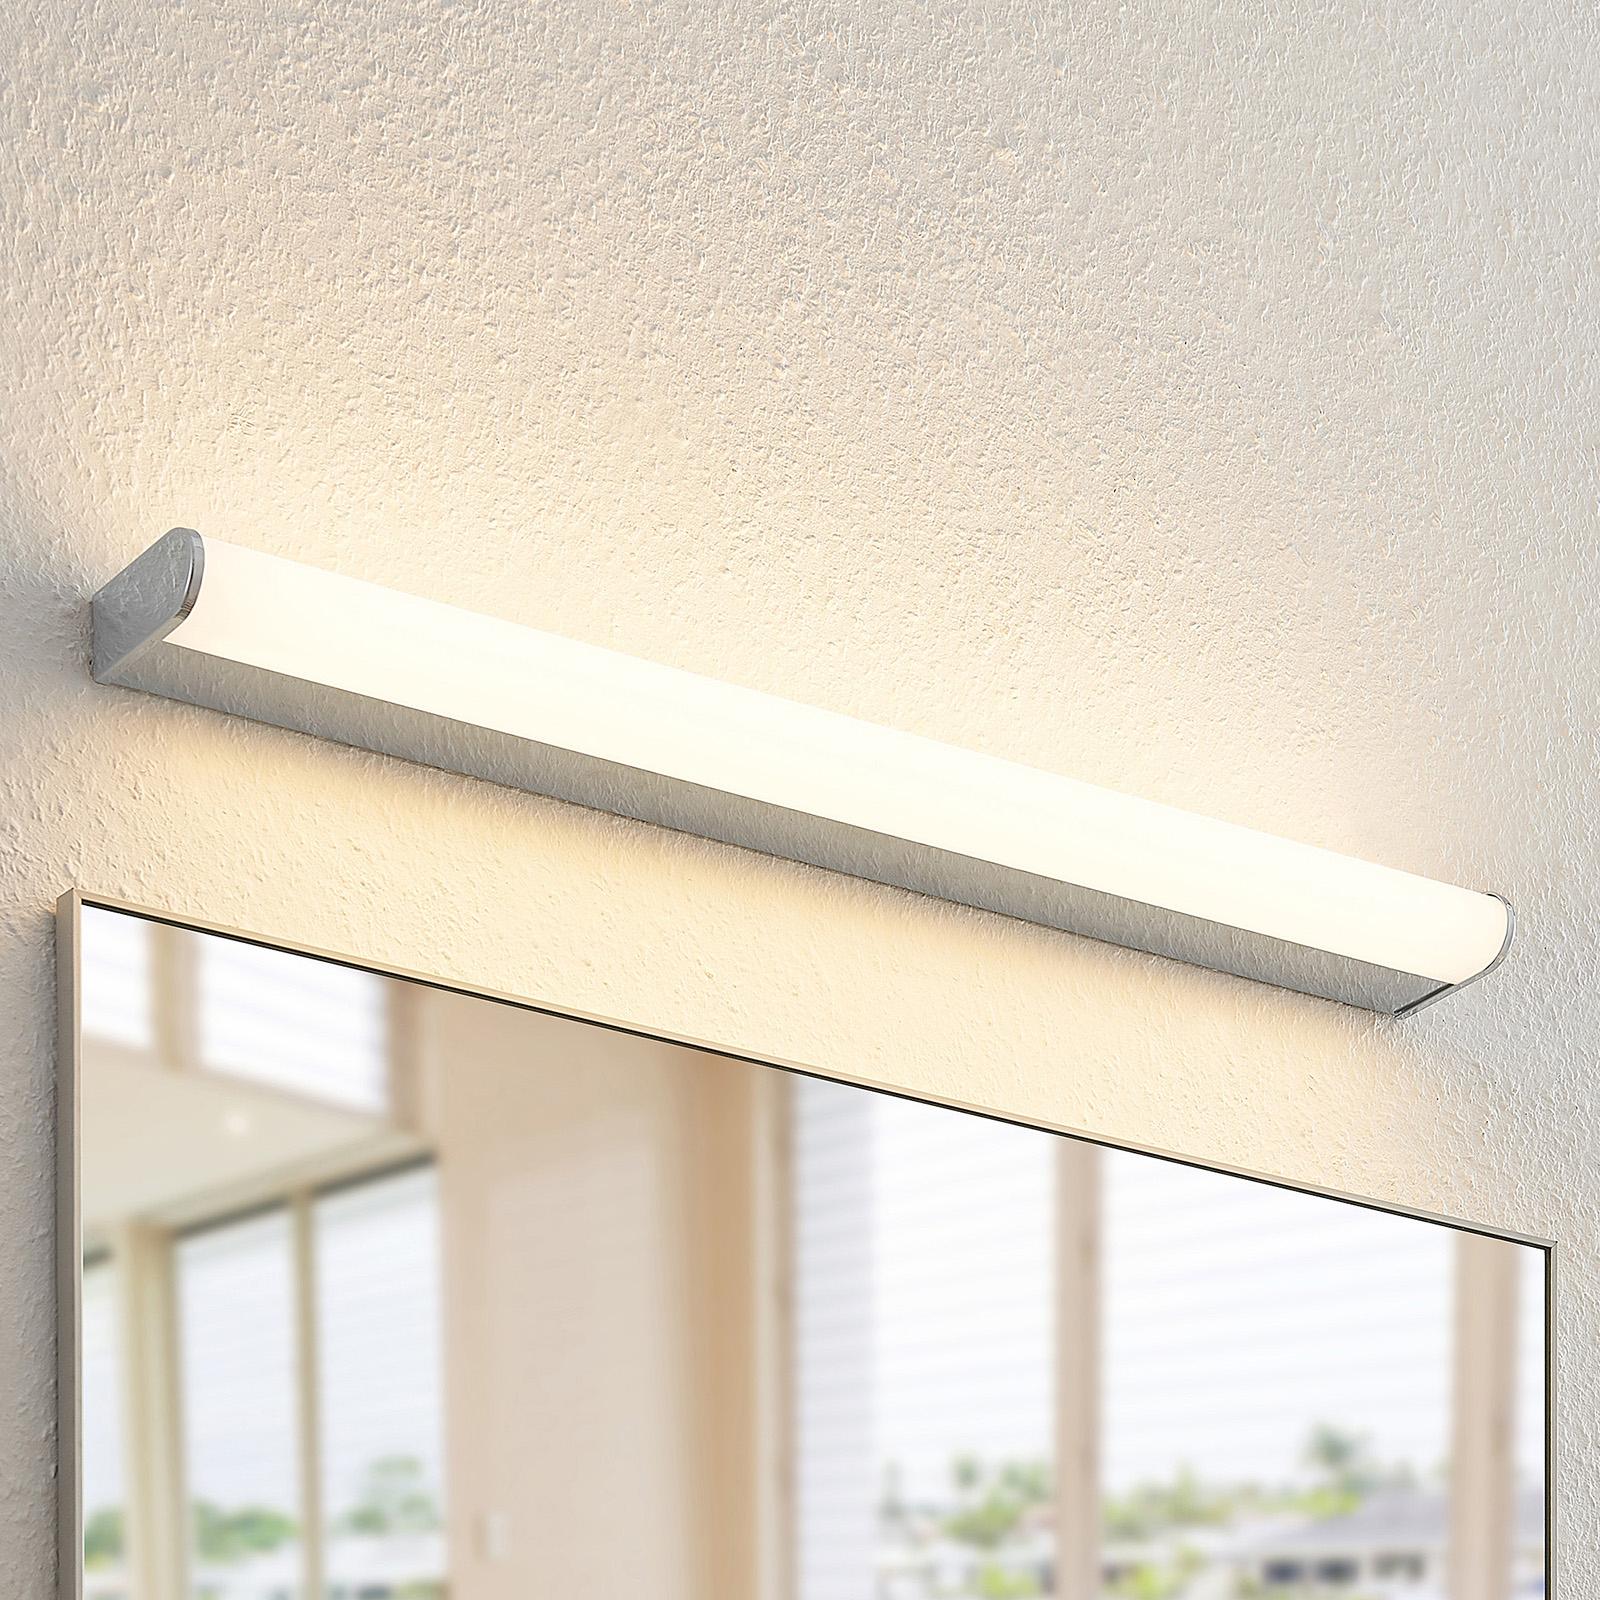 Arcchio Ecaterina LED-Bad-Wandlampe, chrom, 70 cm